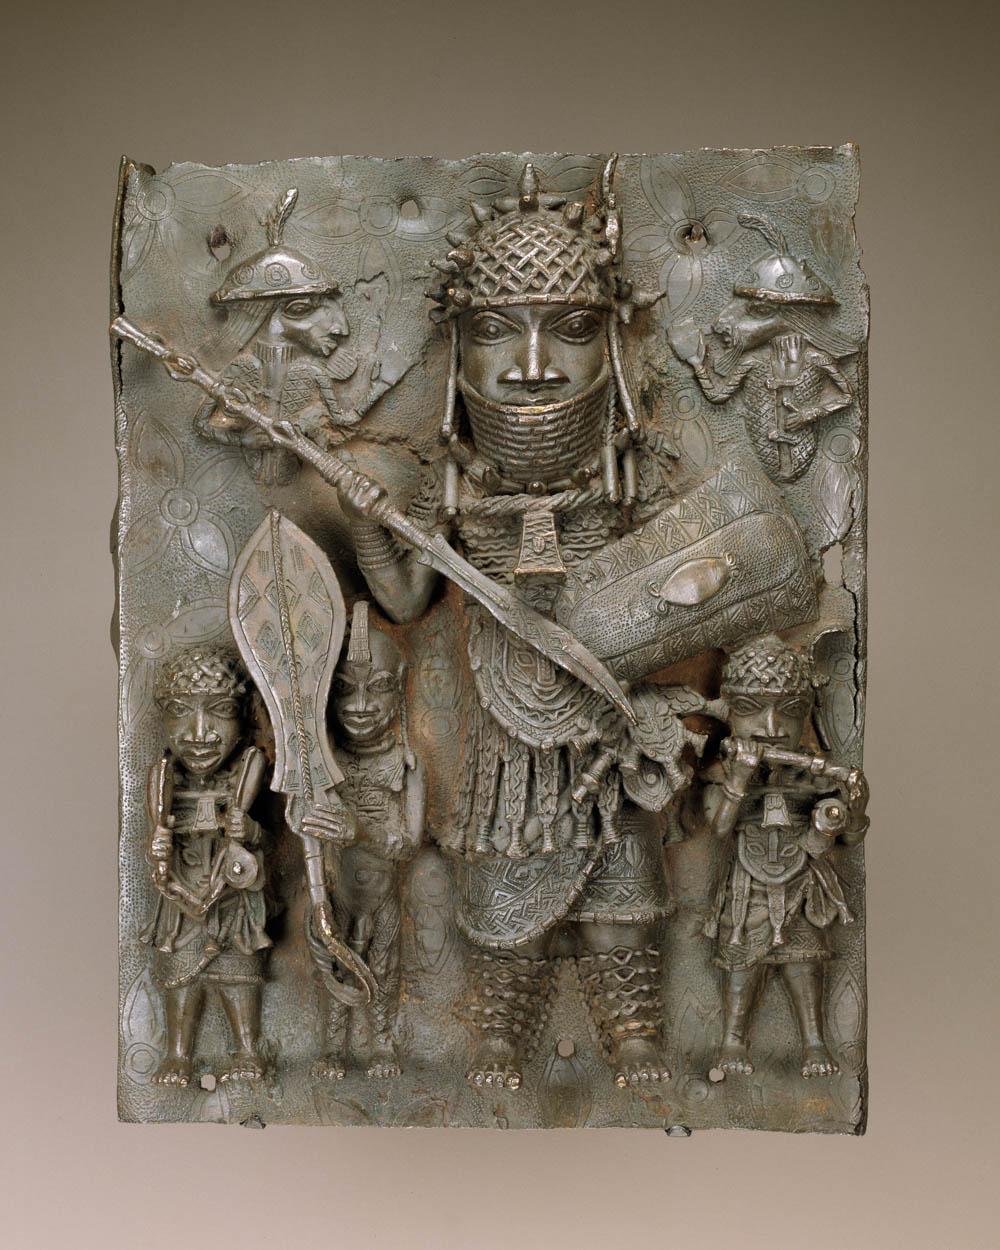 the art of benin Benin music -- kona : djo  play now mix - benin music- don metok : gnonnou youtube benin-nel oliver- baby girl  benin-sagbohan danialou- djo.